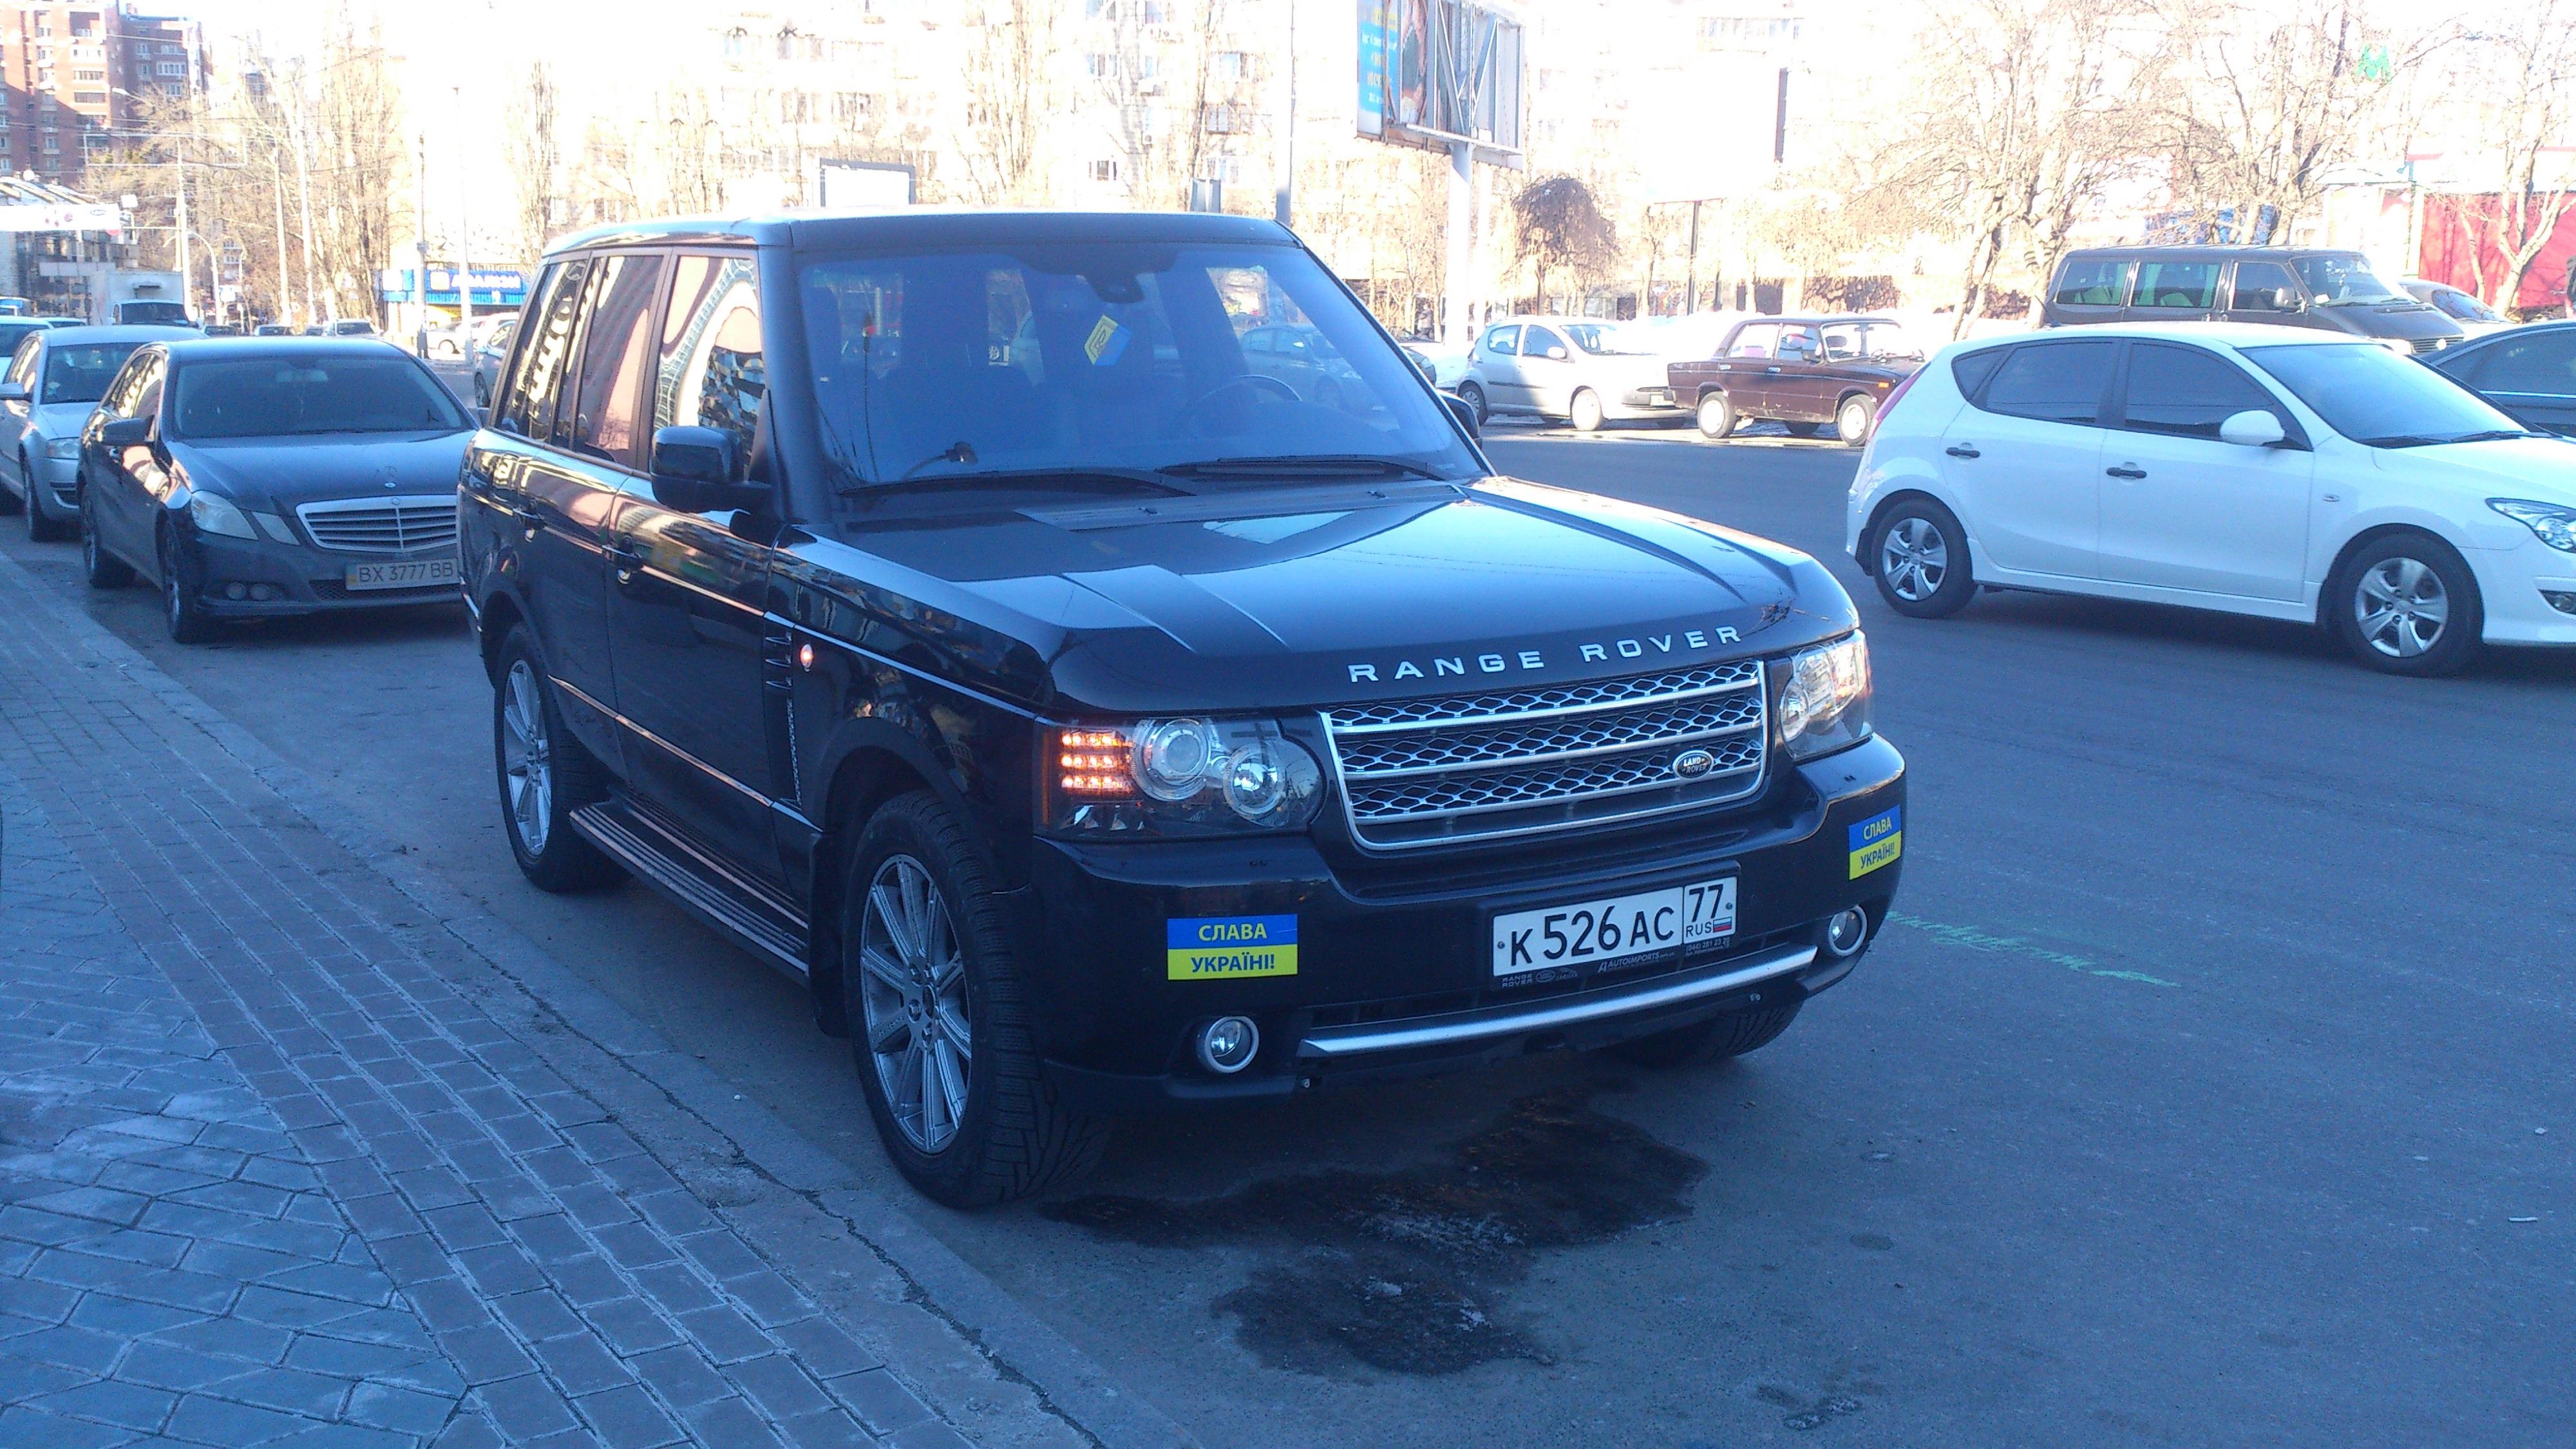 Владелец Range Rover «креативно замаскировал автомобиль под украинский» 2